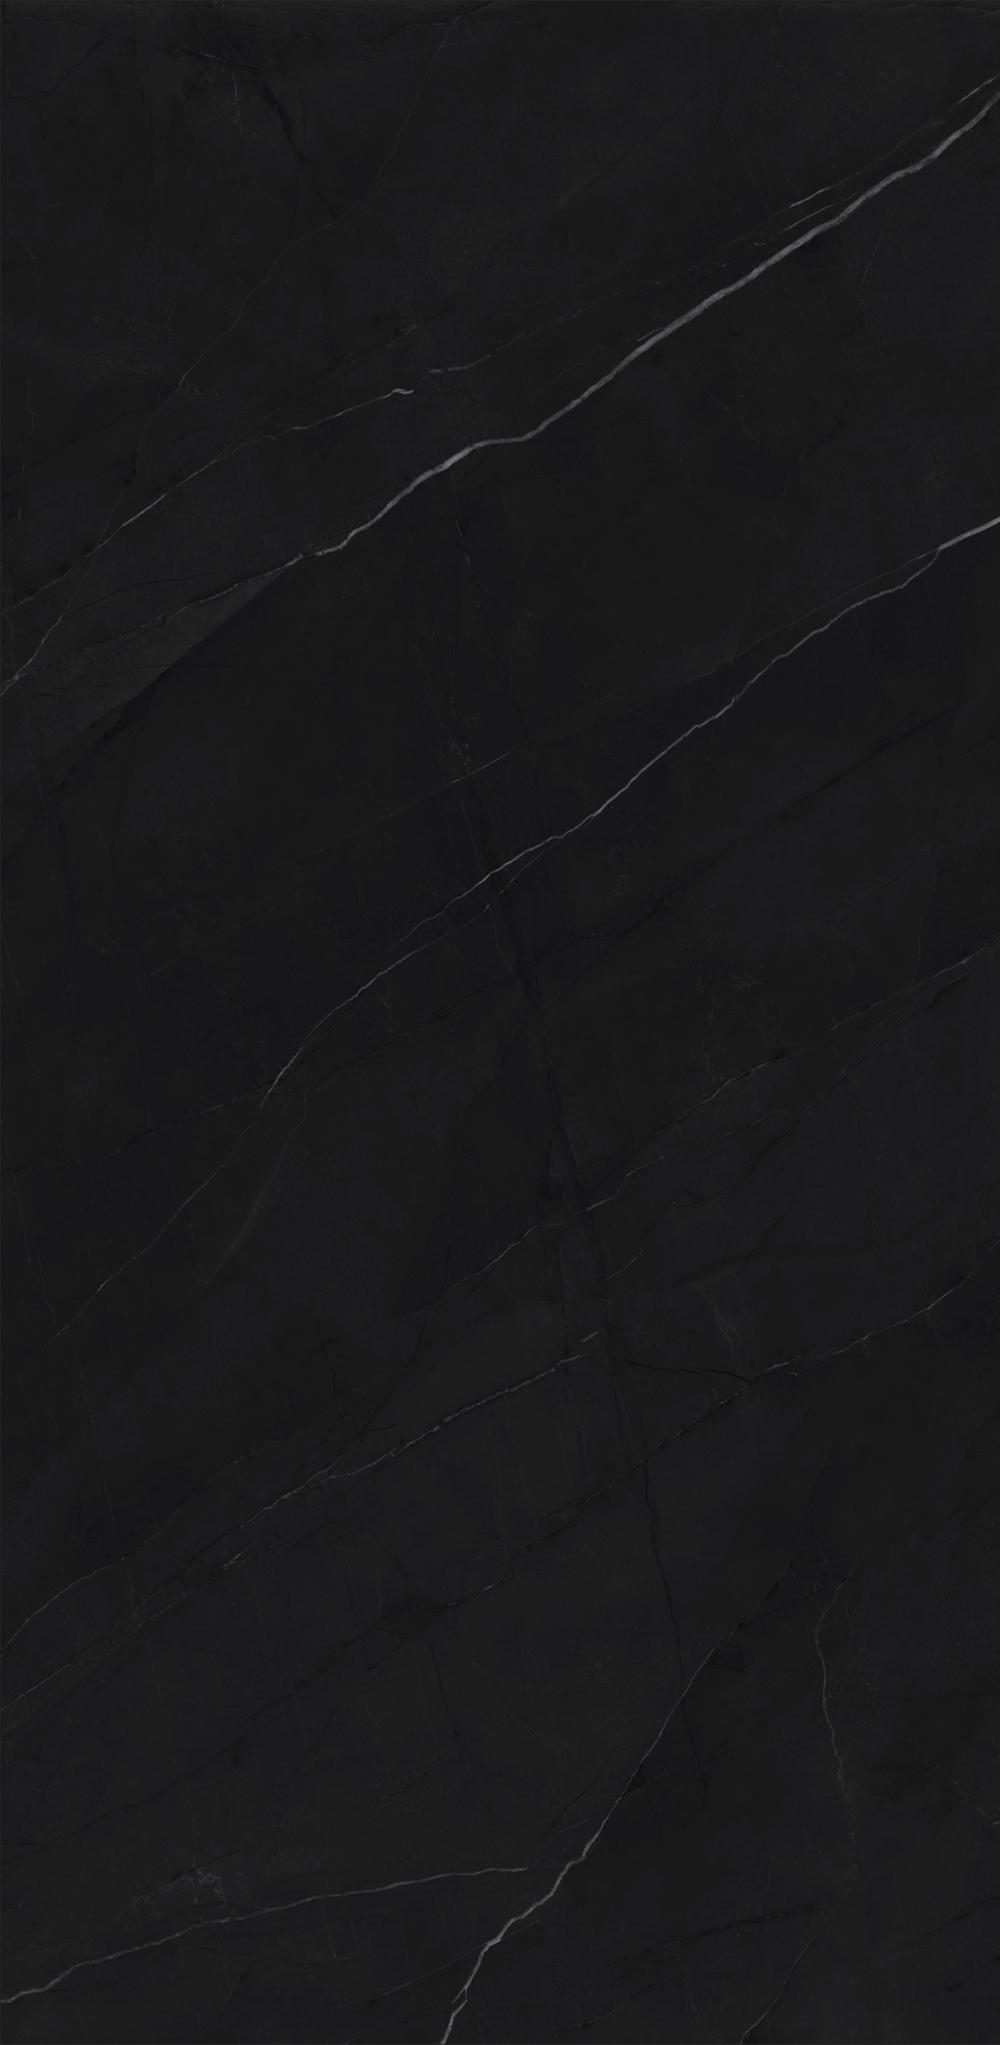 HJ9L2412017皓影幻夜(亮光,3片连纹)